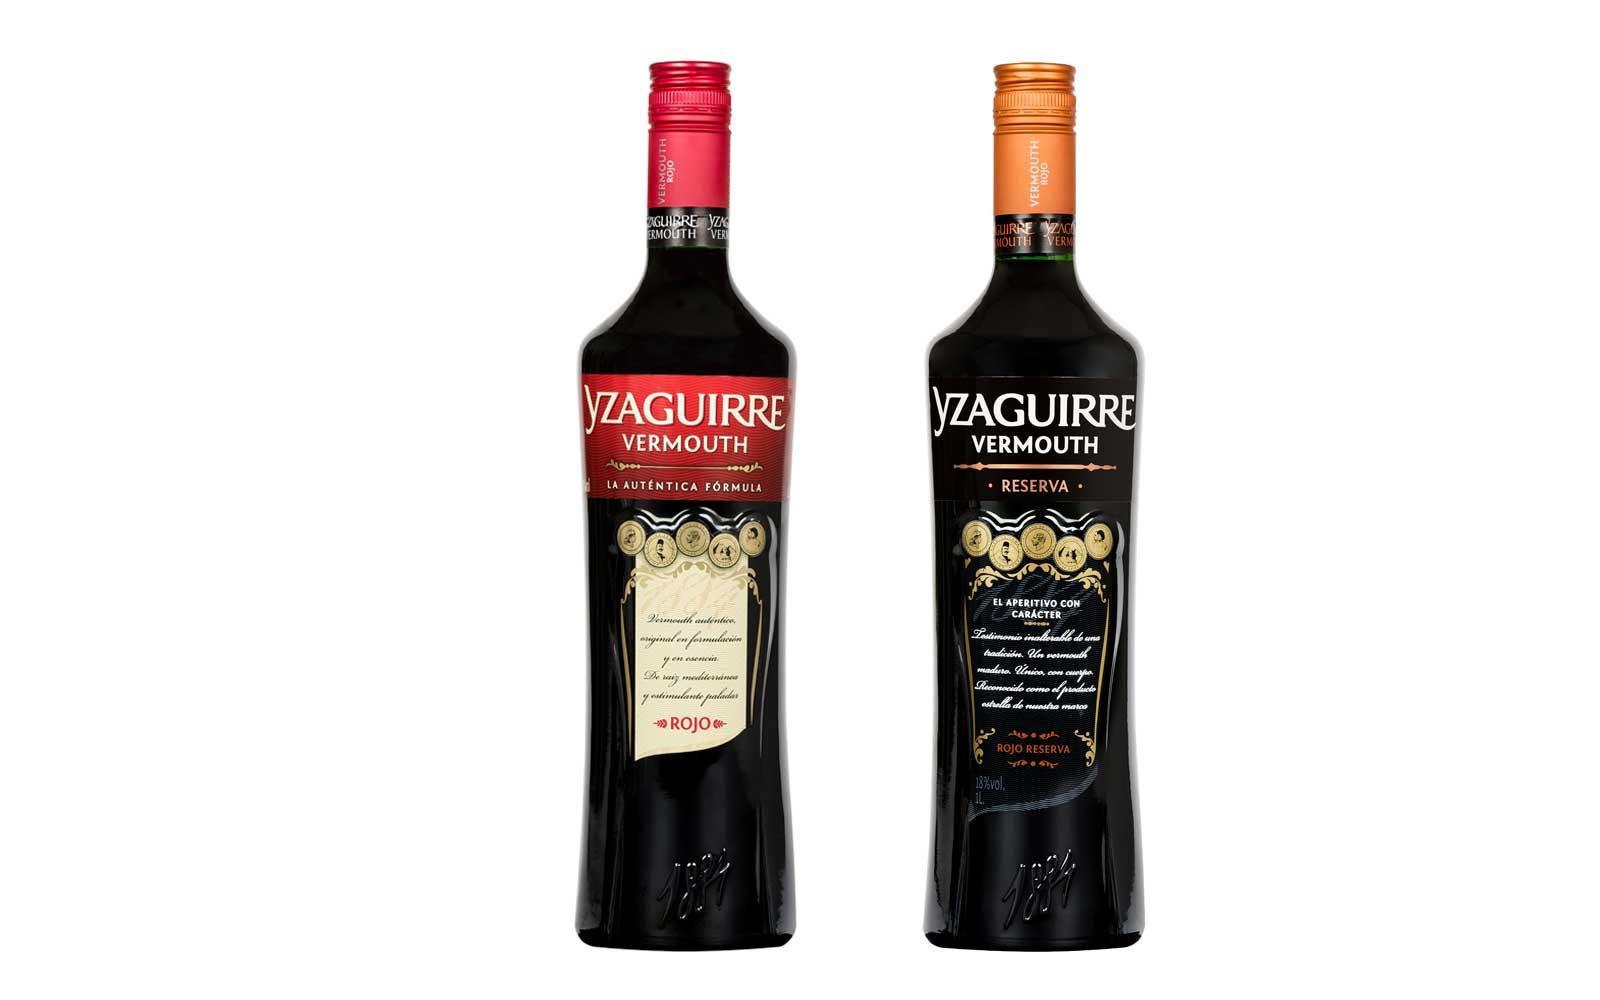 Yzaguirre Vermouth - Spain